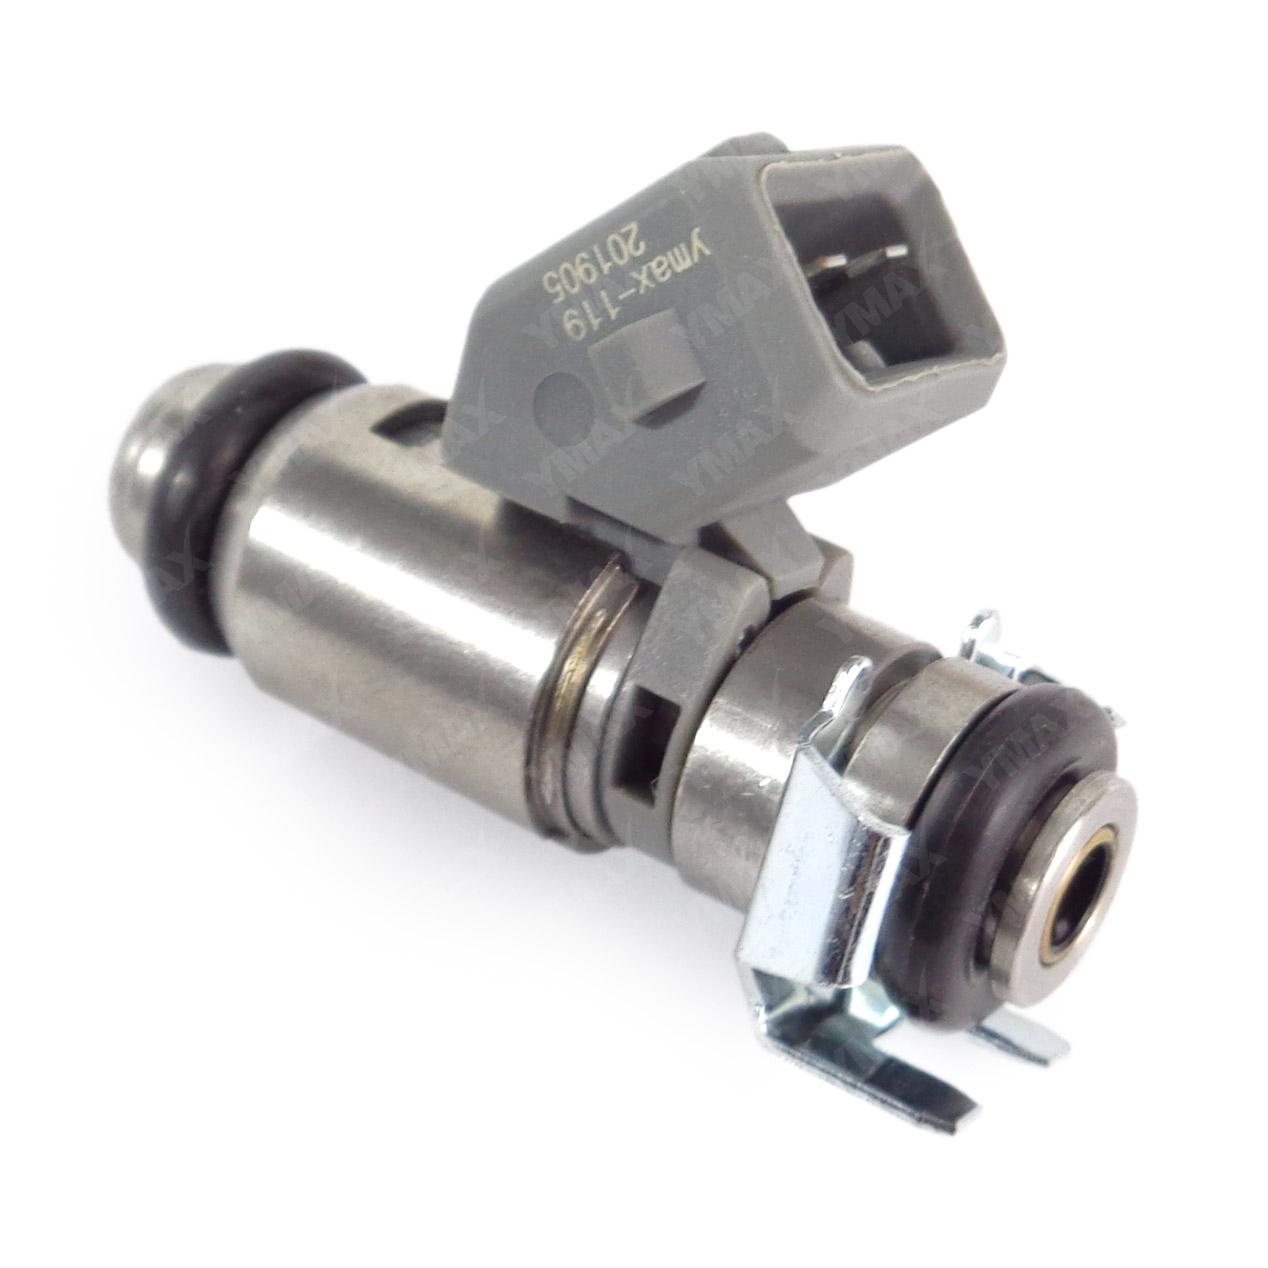 Bico Injetor Combustível FIESTA KA ROCAM - Gasolina (MPO119)